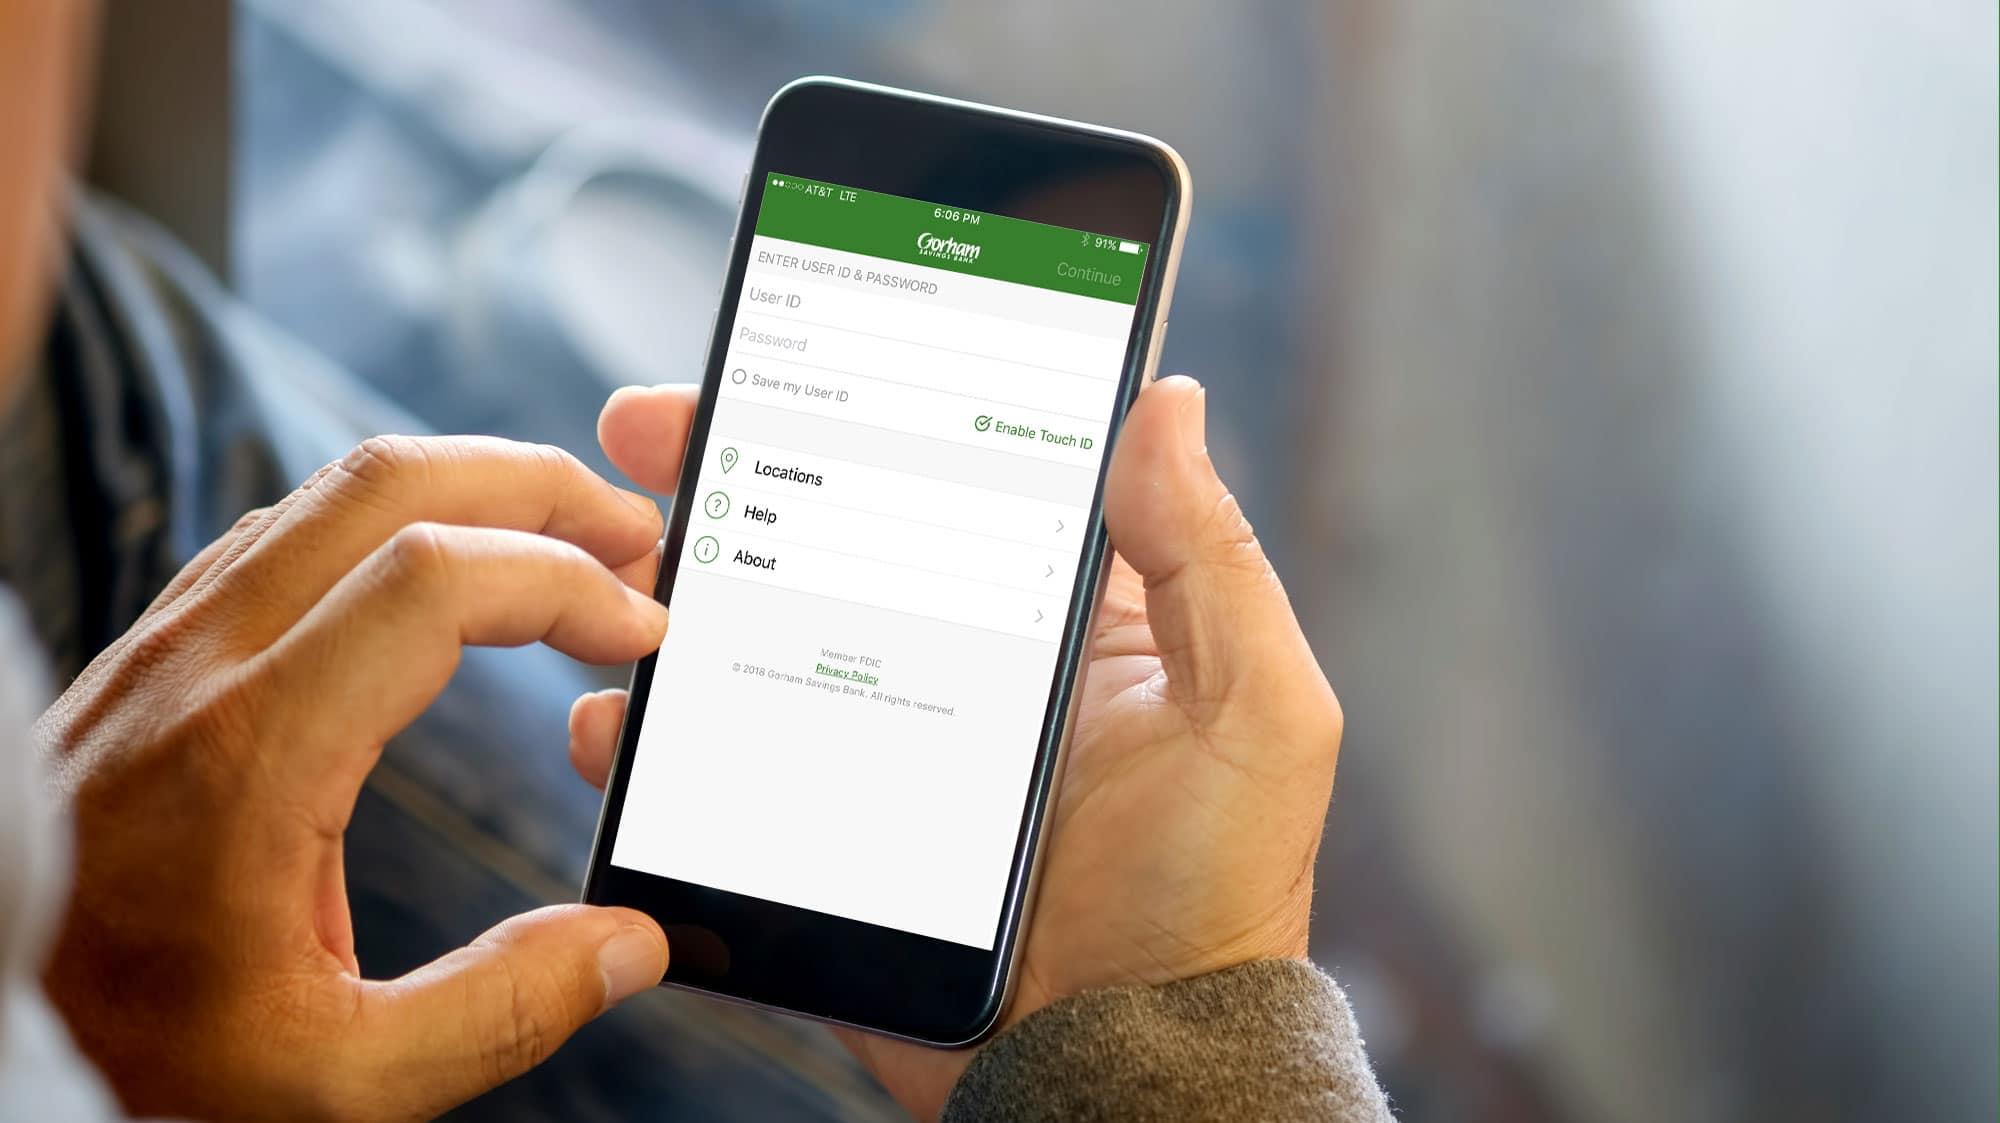 Gorham Savings Bank Mobile App on an iPhone